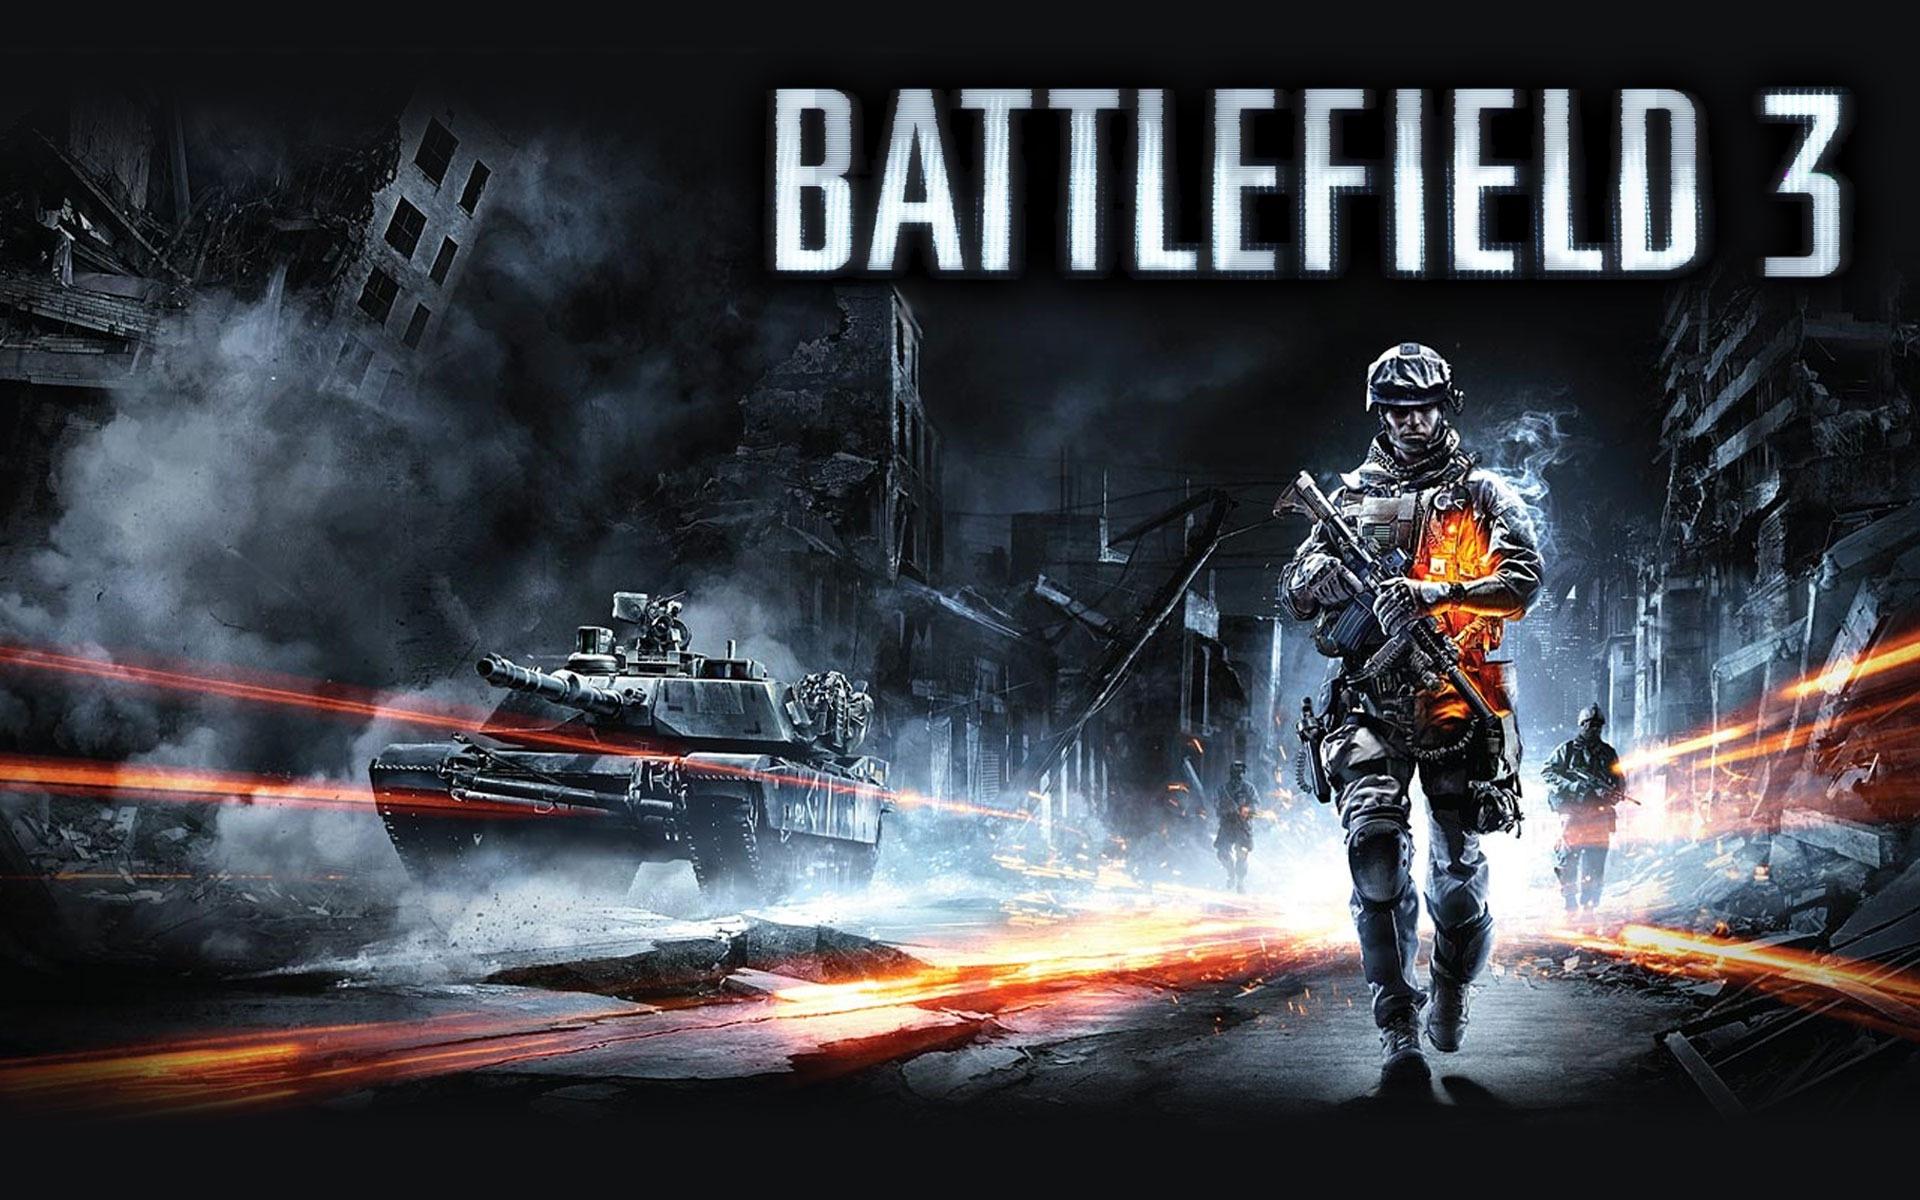 Games №0835 - Battlefield 3 Hd Wallpapers 1080p , HD Wallpaper & Backgrounds